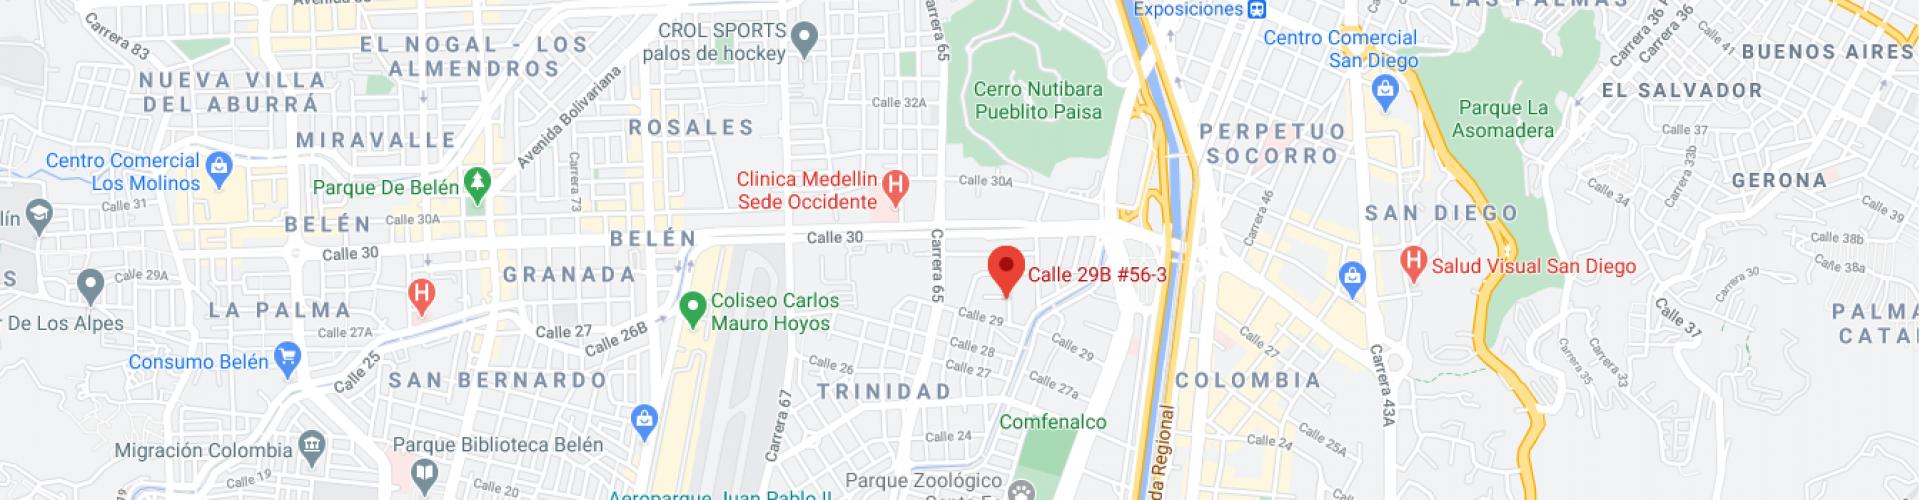 https://laabogacia.com/wp-content/uploads/2020/09/mapa-1920x500.png